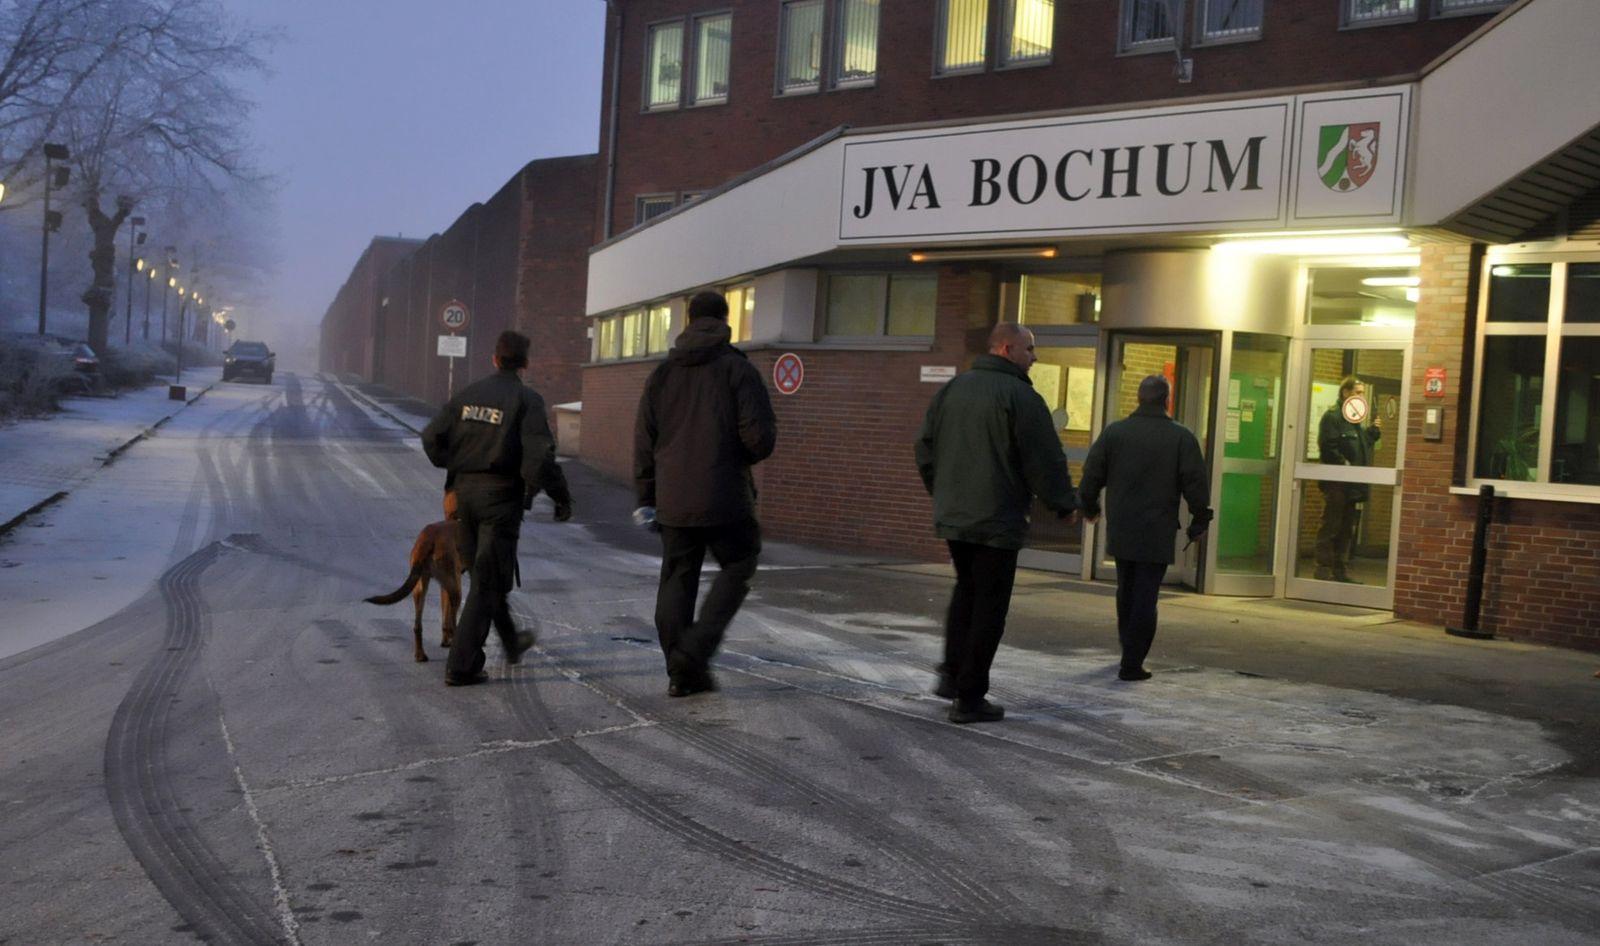 JVA Bochum/ Ausbrüche